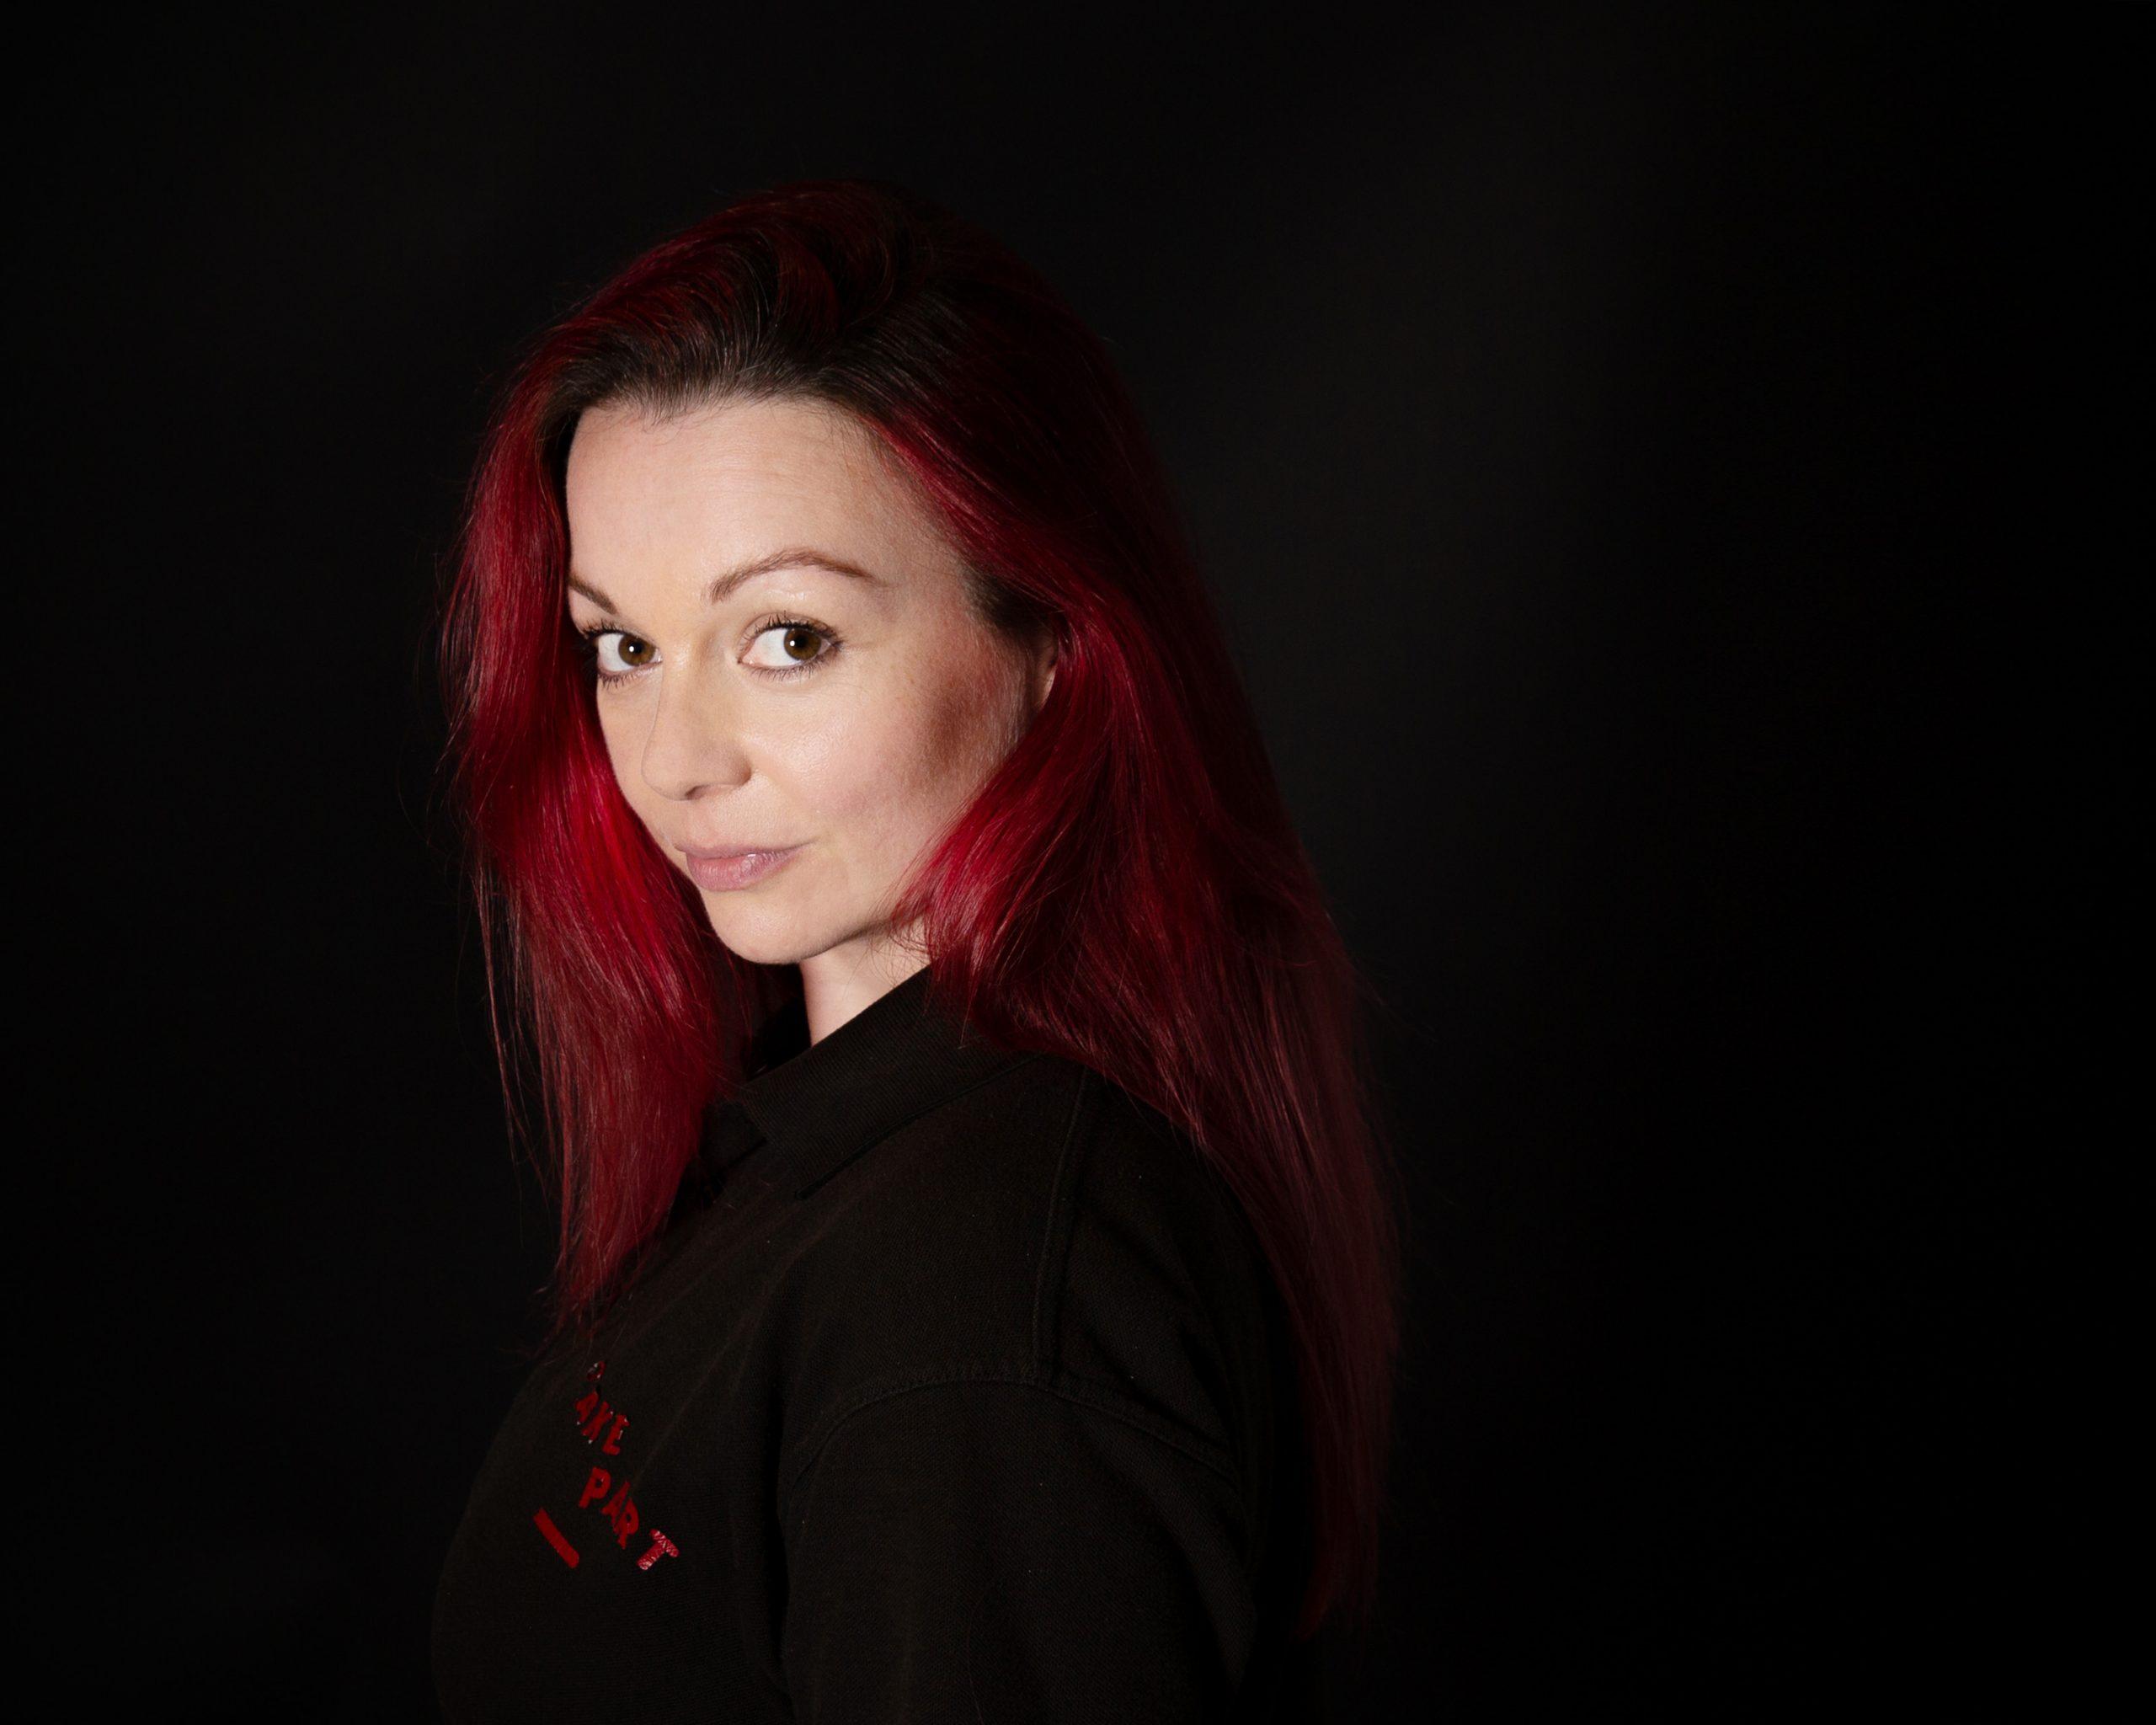 Headshot of Leanne Chance